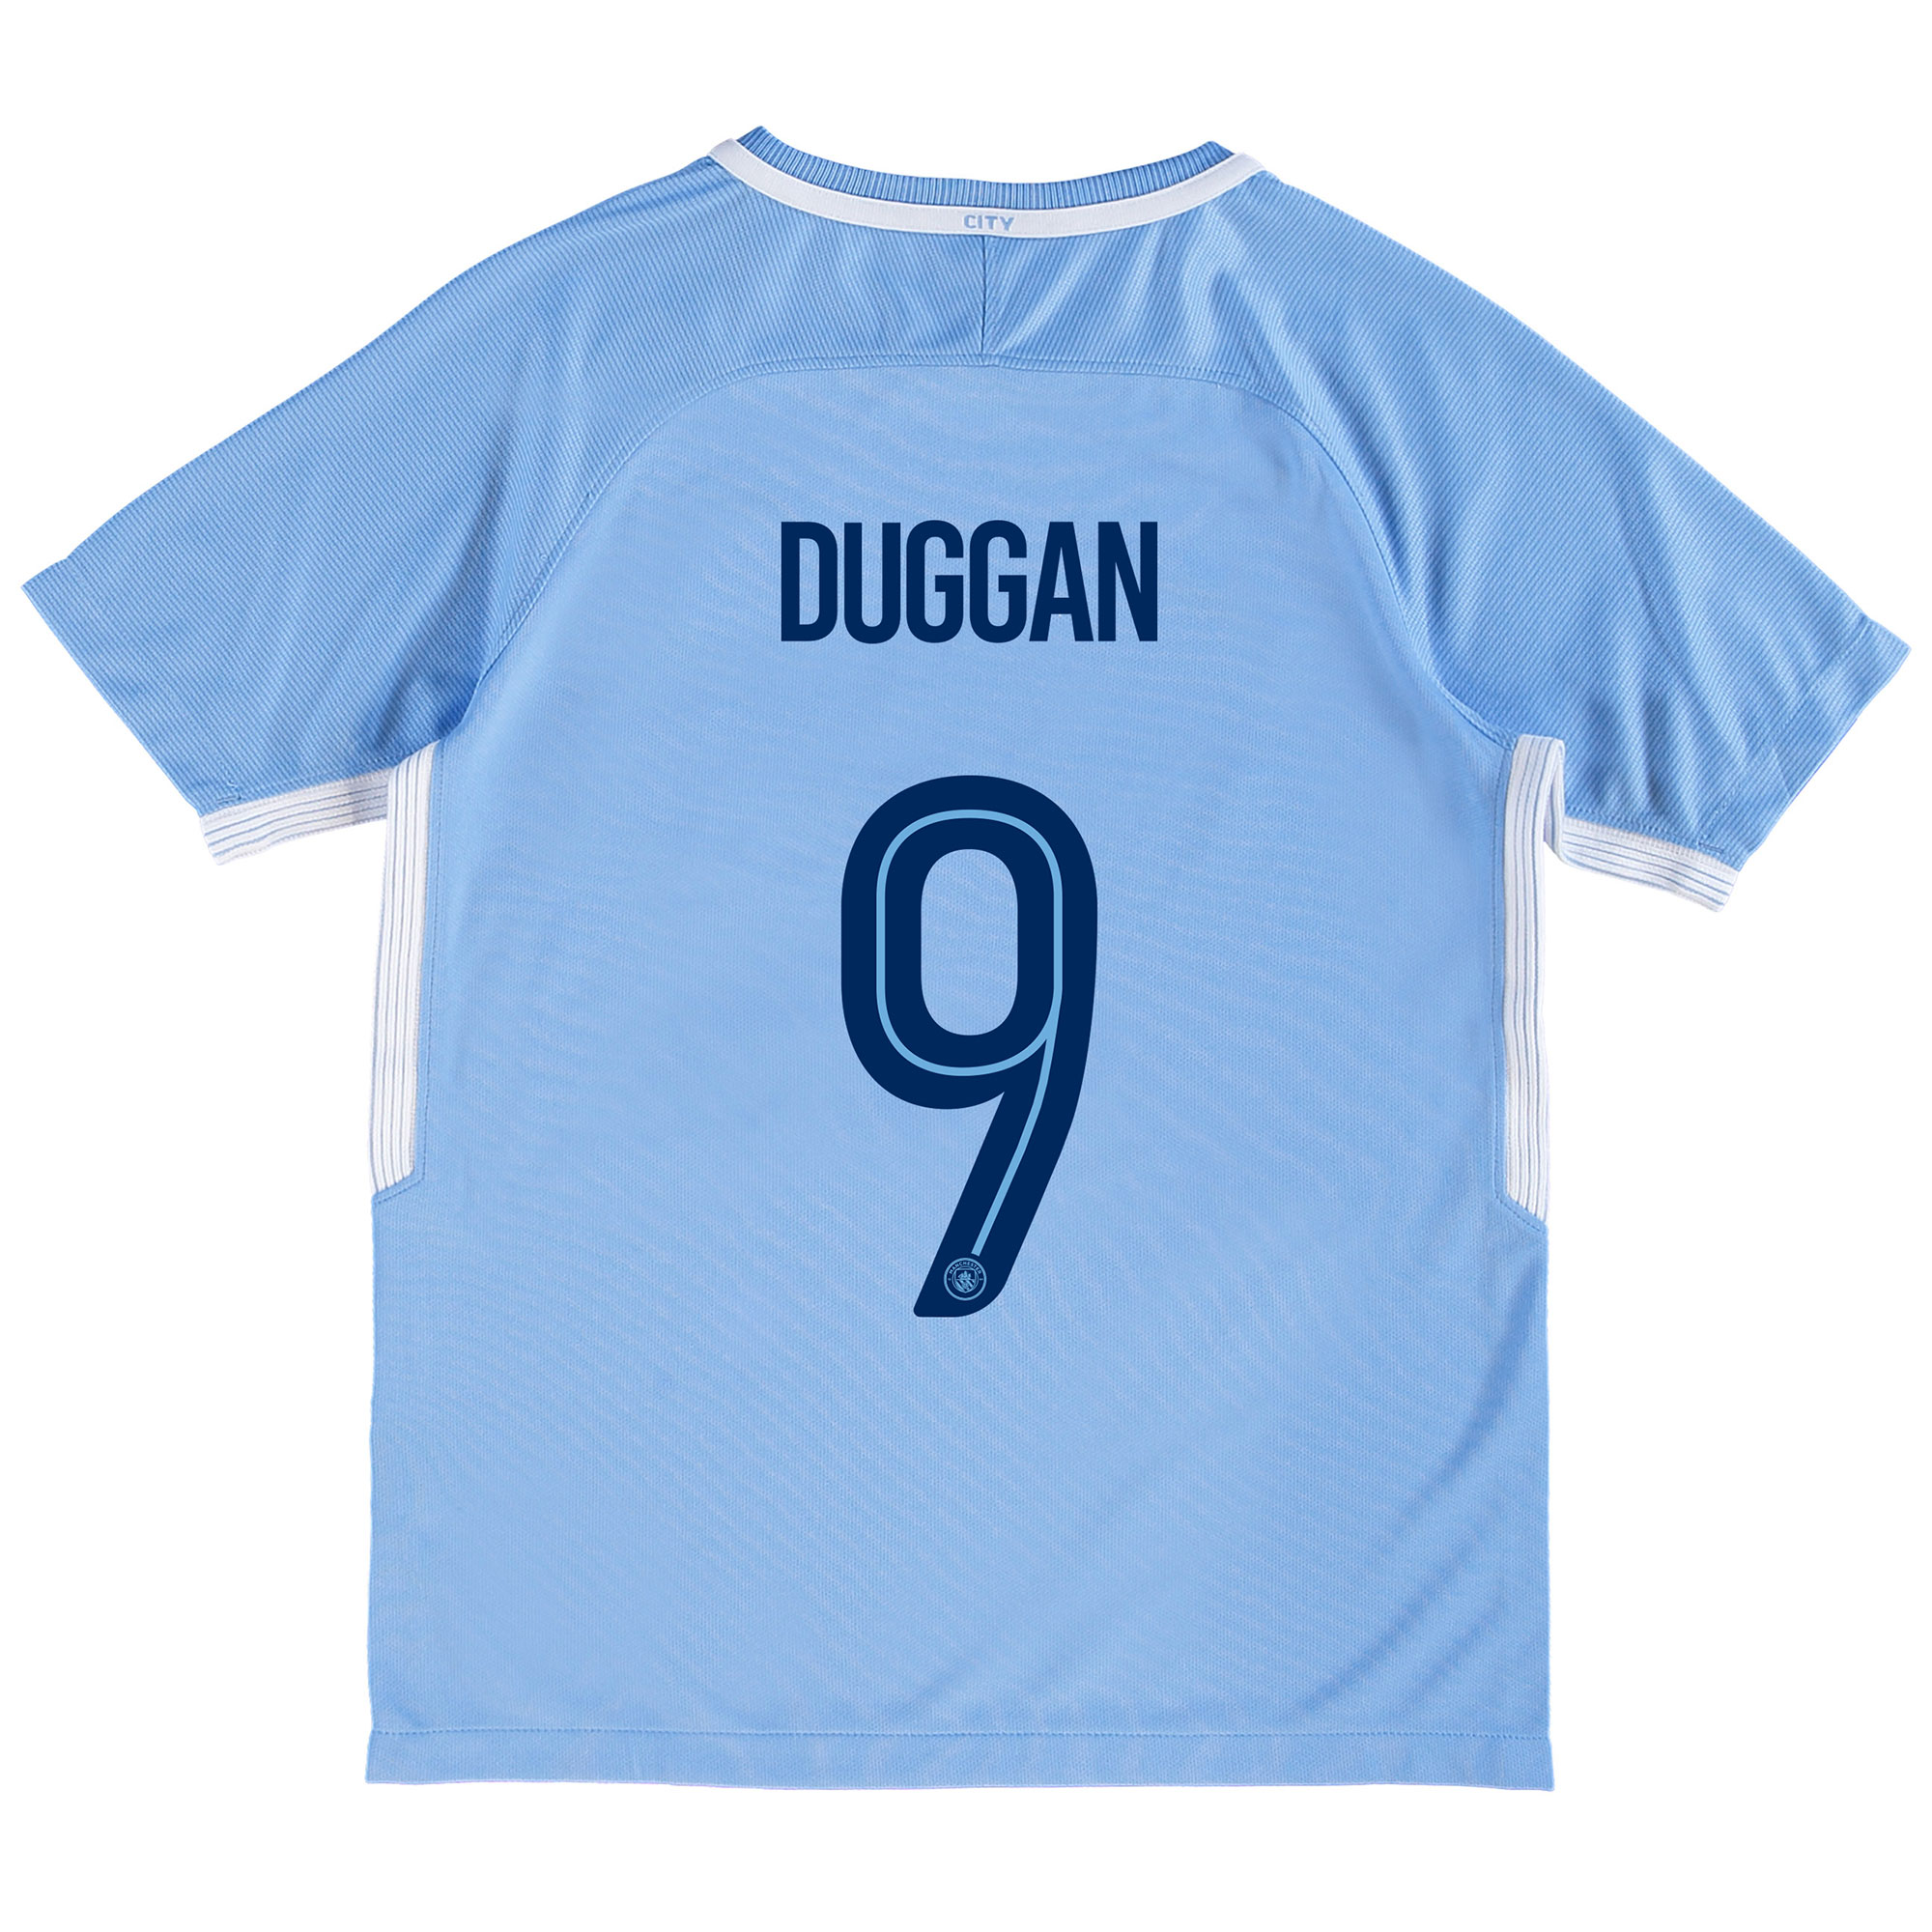 Manchester City Home Stadium Cup Shirt 2017-18 - Kids with Duggan 9 pr